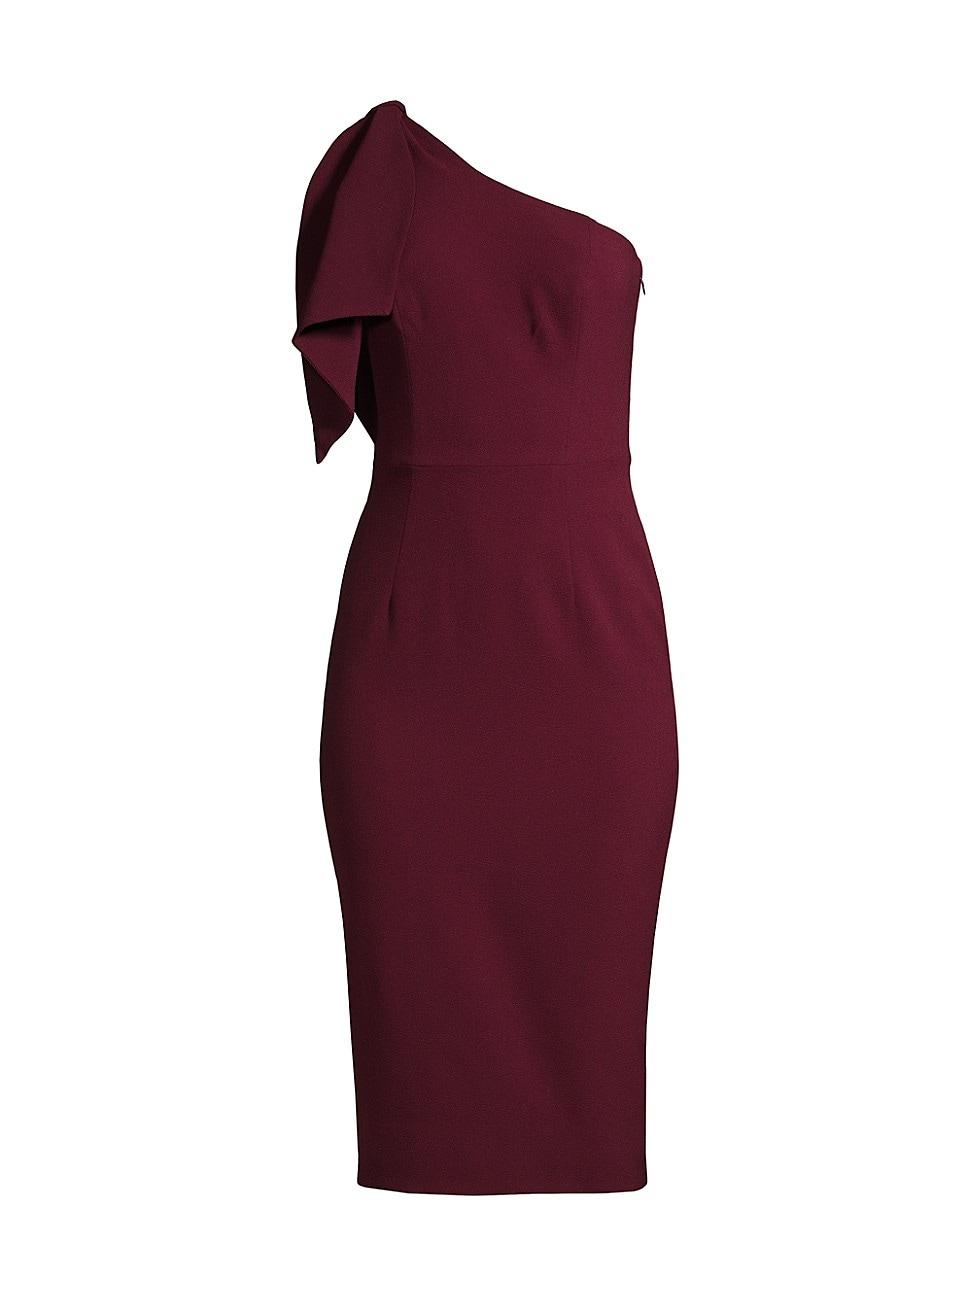 Dress The Population WOMEN'S TIFFANY ONE-SHOULDER DRESS